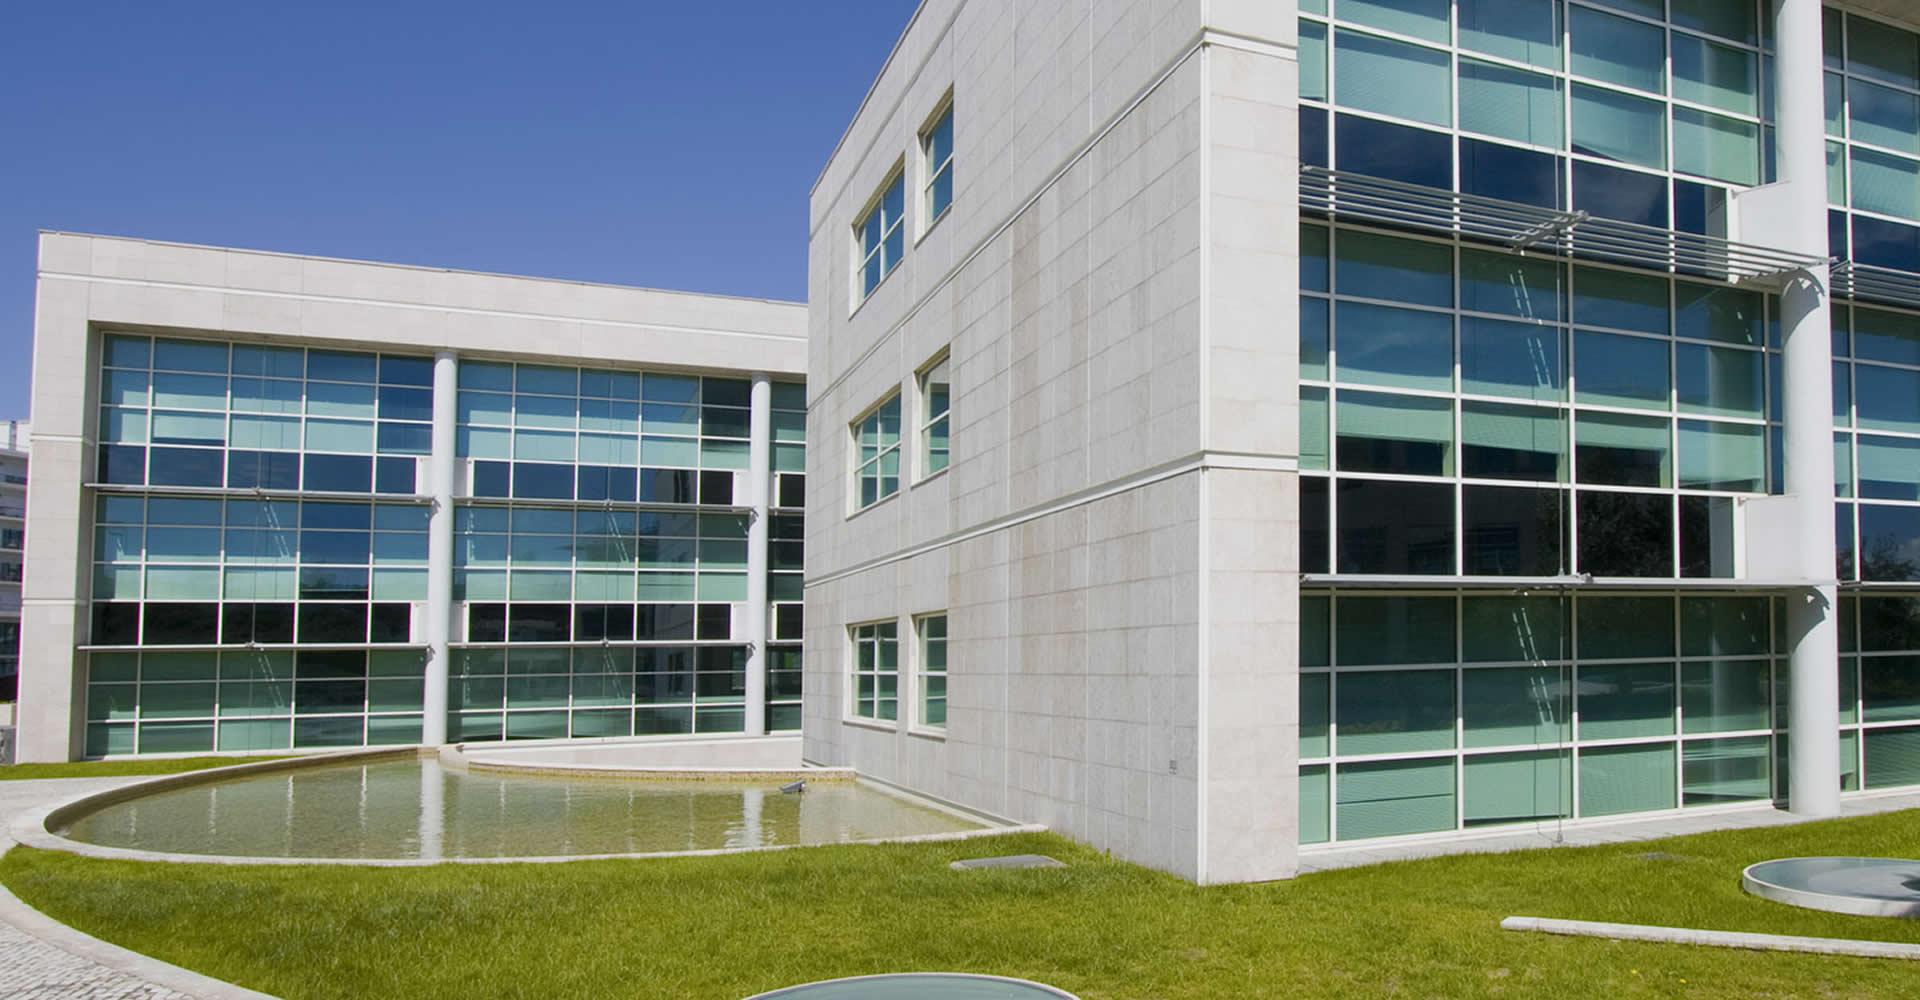 Estudio de arquitectura en getafe arquitectos en getafe for Estudios de arquitectura famosos